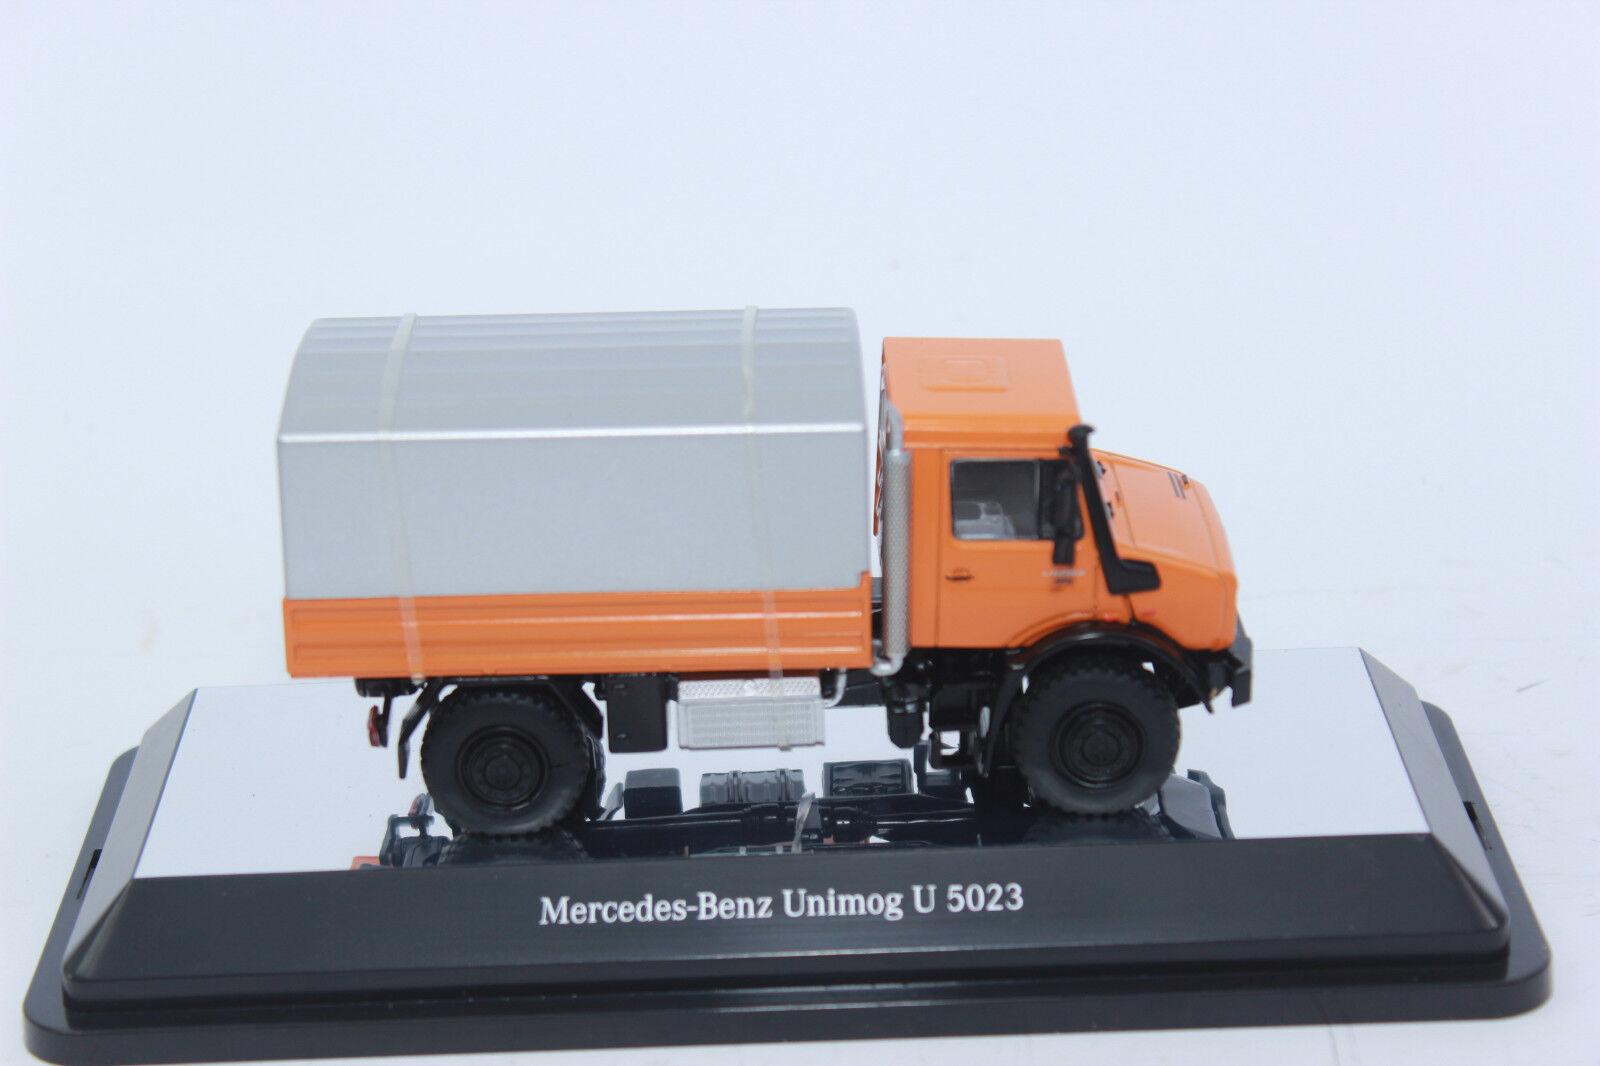 NZG 911 65 65 65 MERCEDES BENZ UNIMOG orange silver 1 50 NEU in OVP     SONDERPREIS    c15367